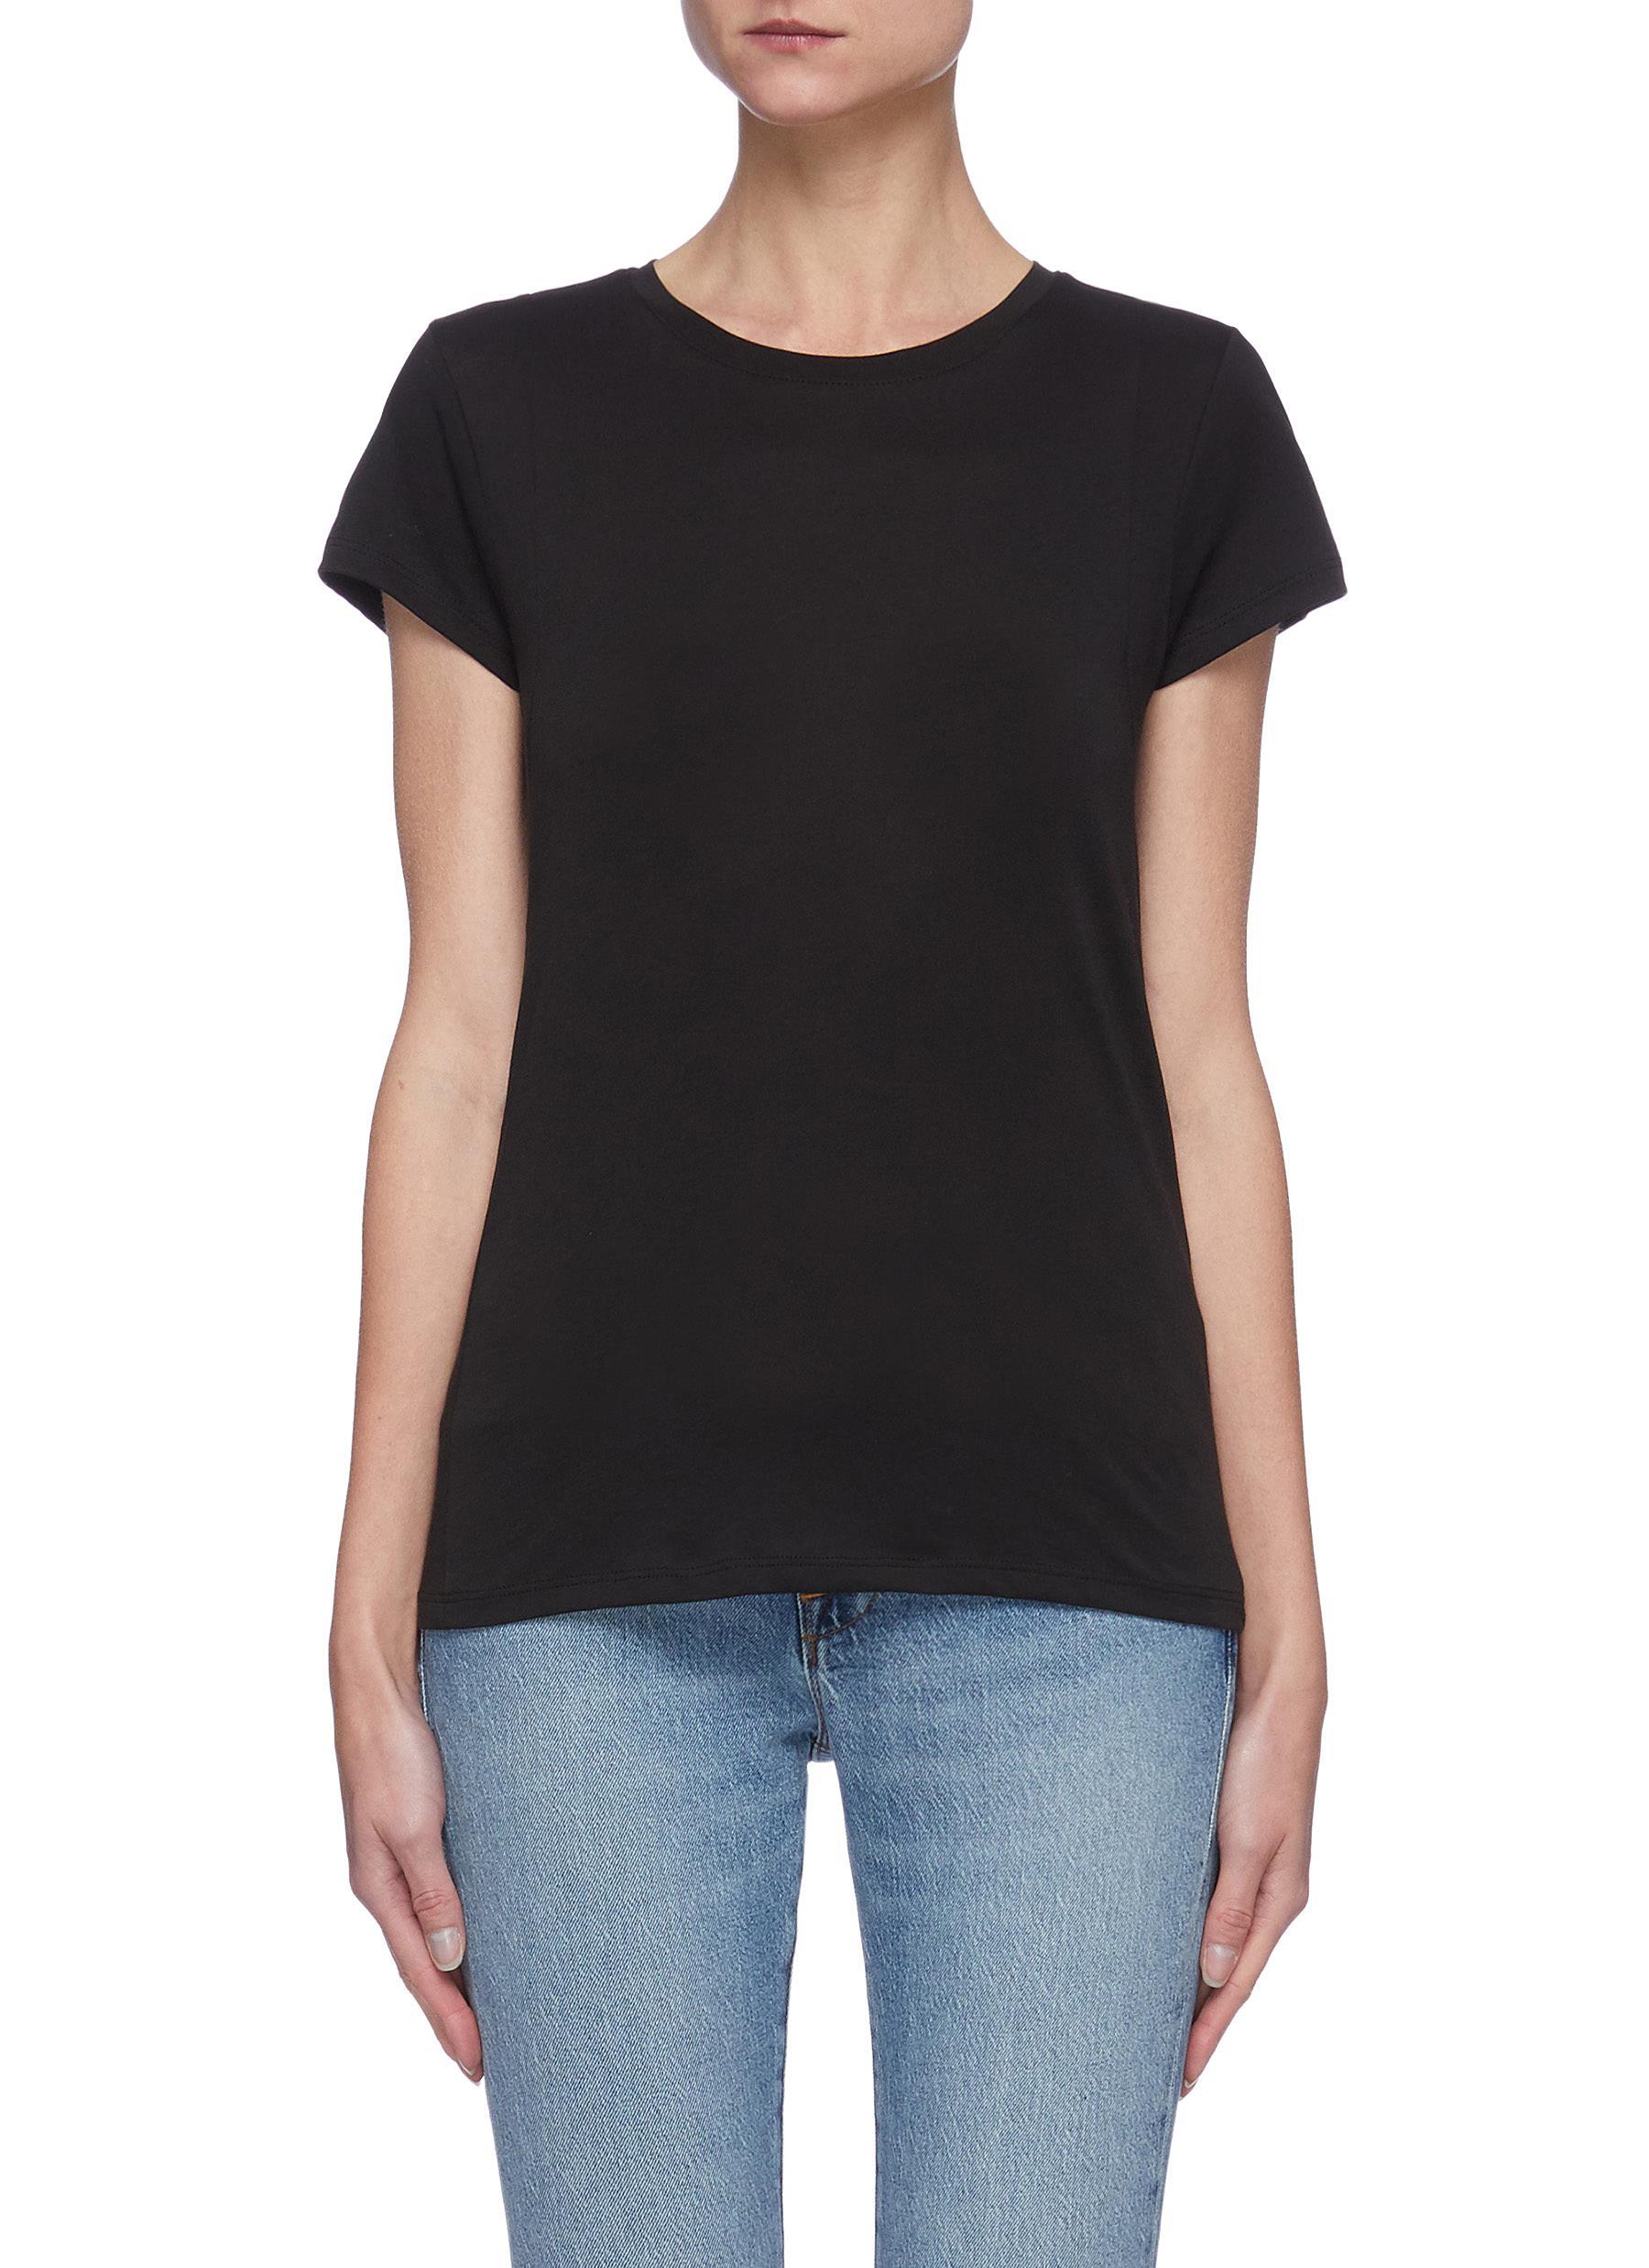 """""Le Mid' Crewneck Organic Pima Cotton T-shirt"""